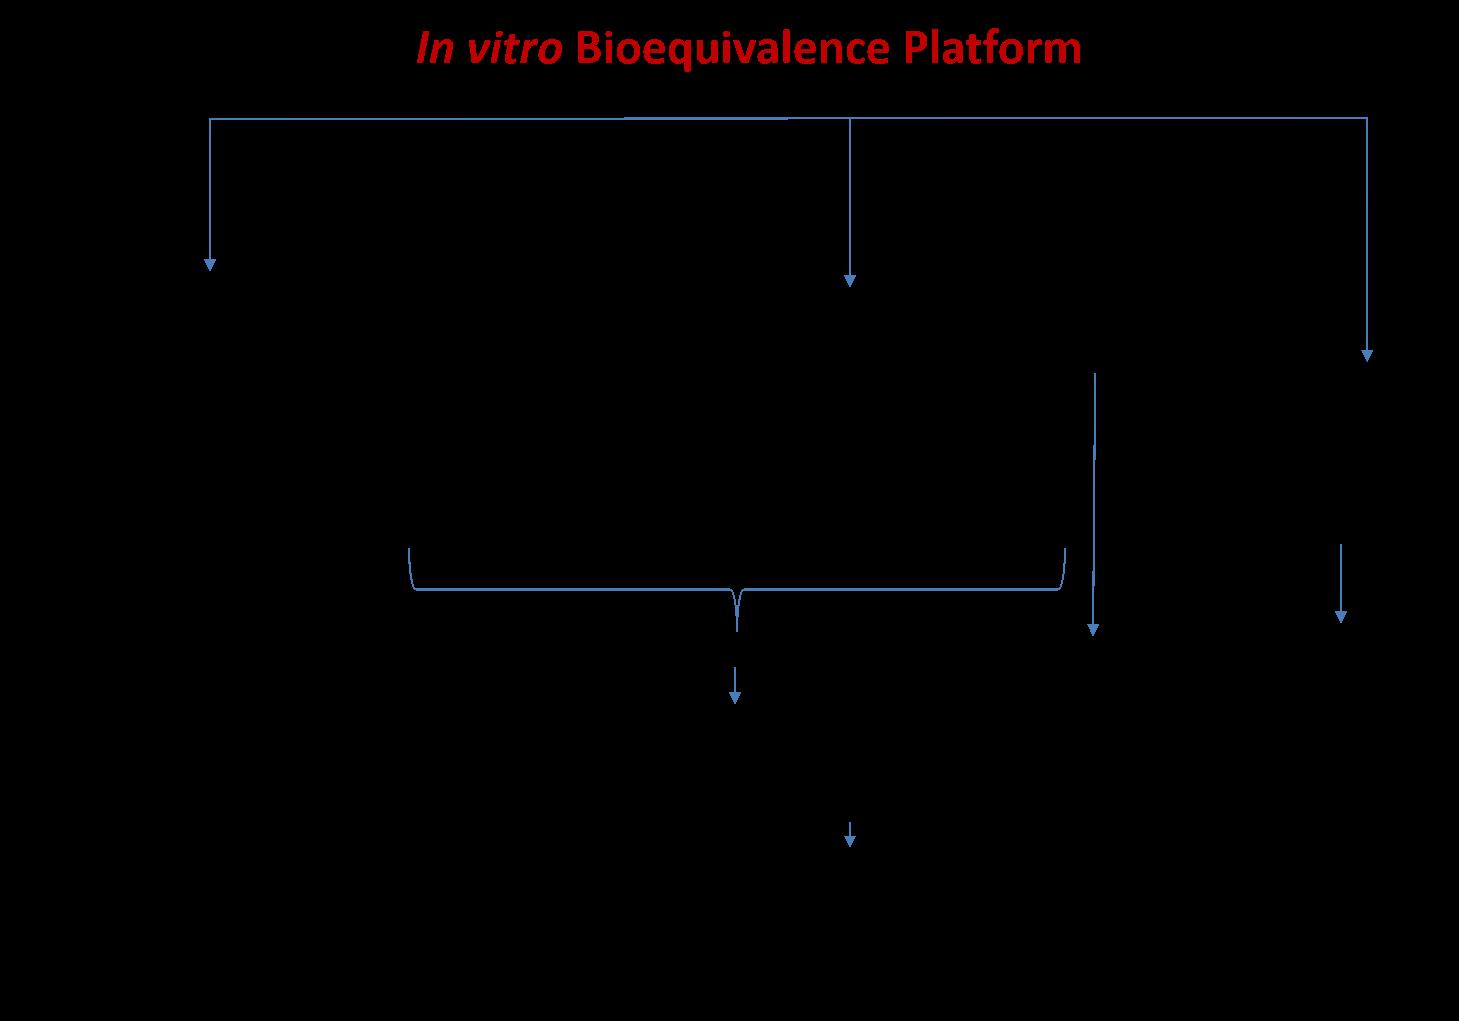 In Vitro Bioequivalence Services